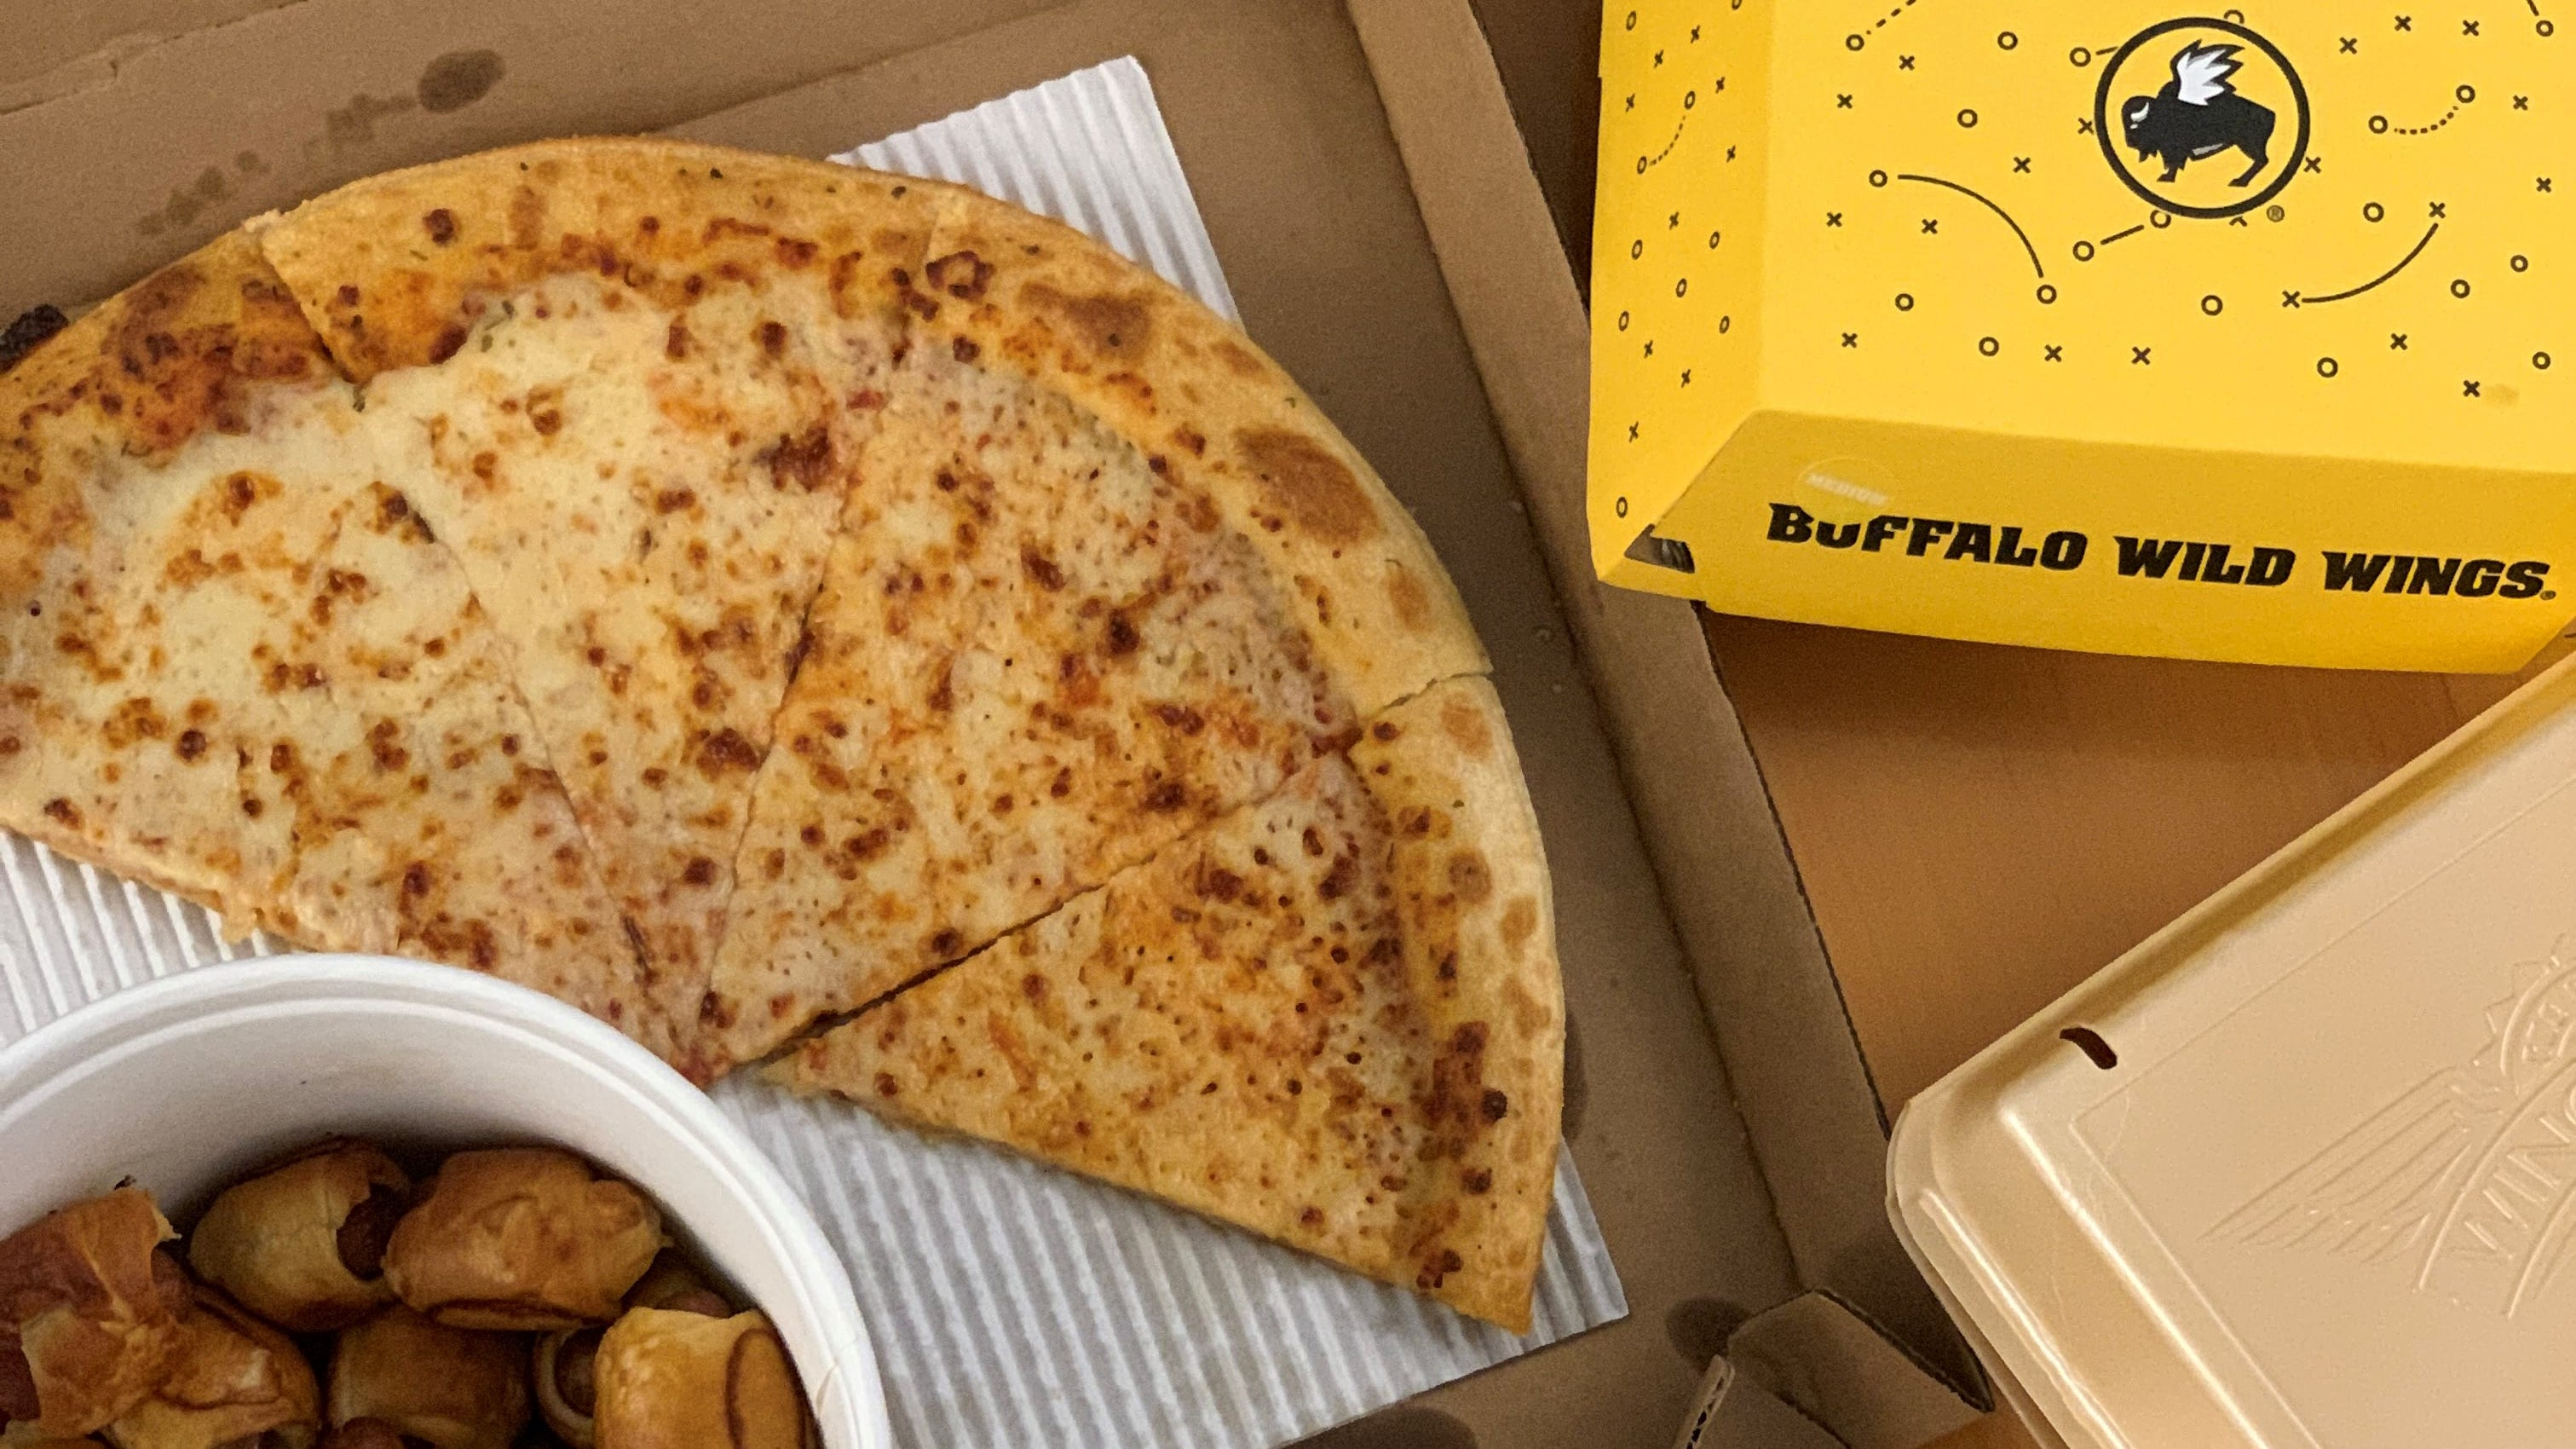 Super Bowl Food Deals What Should You Serve At Your Super Bowl Party